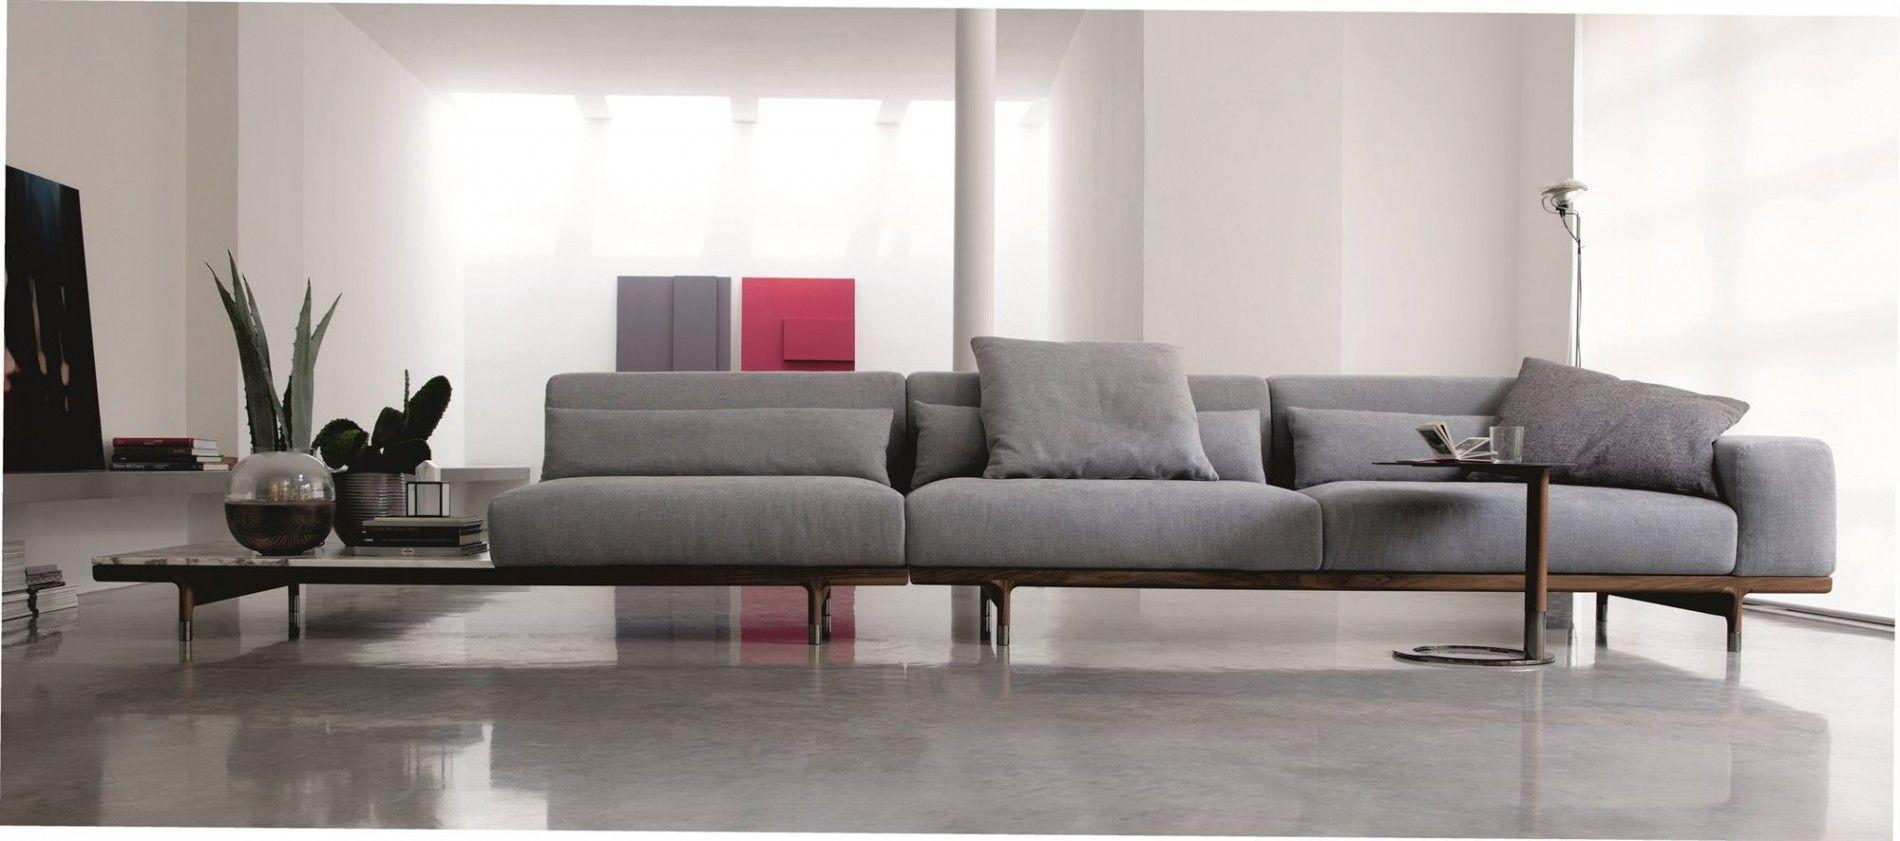 Argo Porada Sofa Lartdevivre Online Furnishing Modern